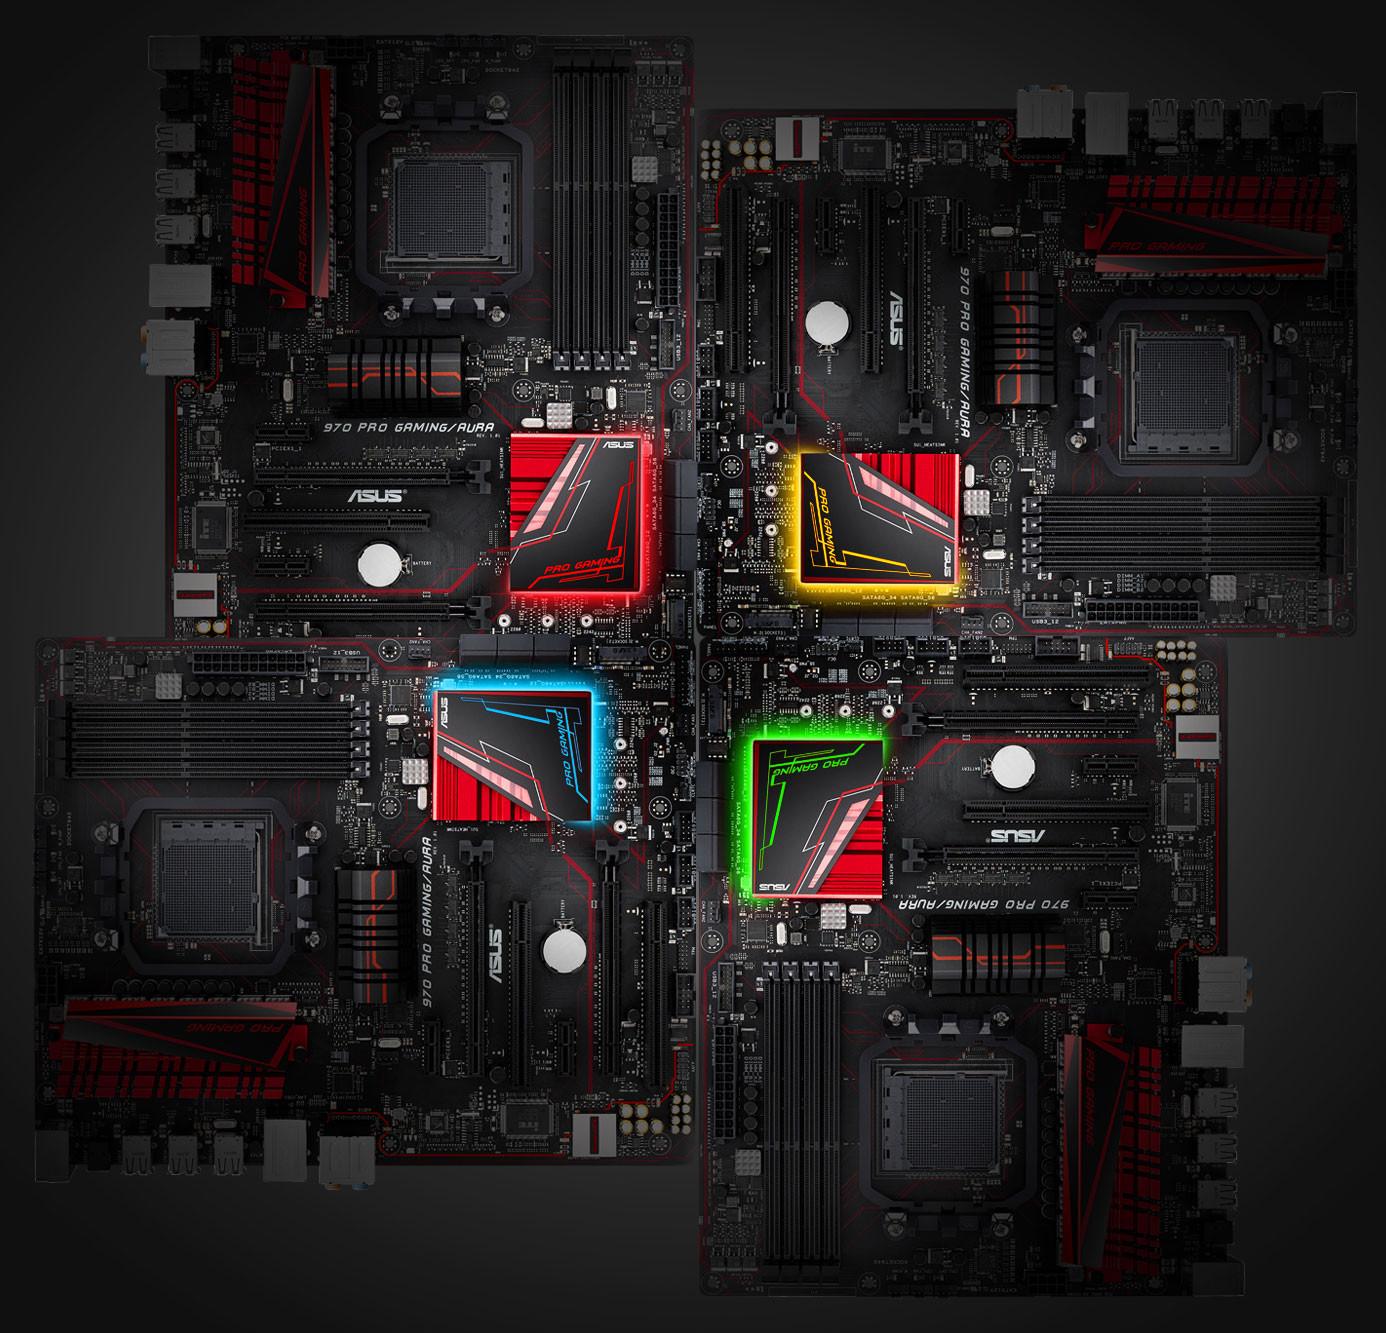 GAZ97XGaming 3 rev 10  Motherboard  GIGABYTE Global